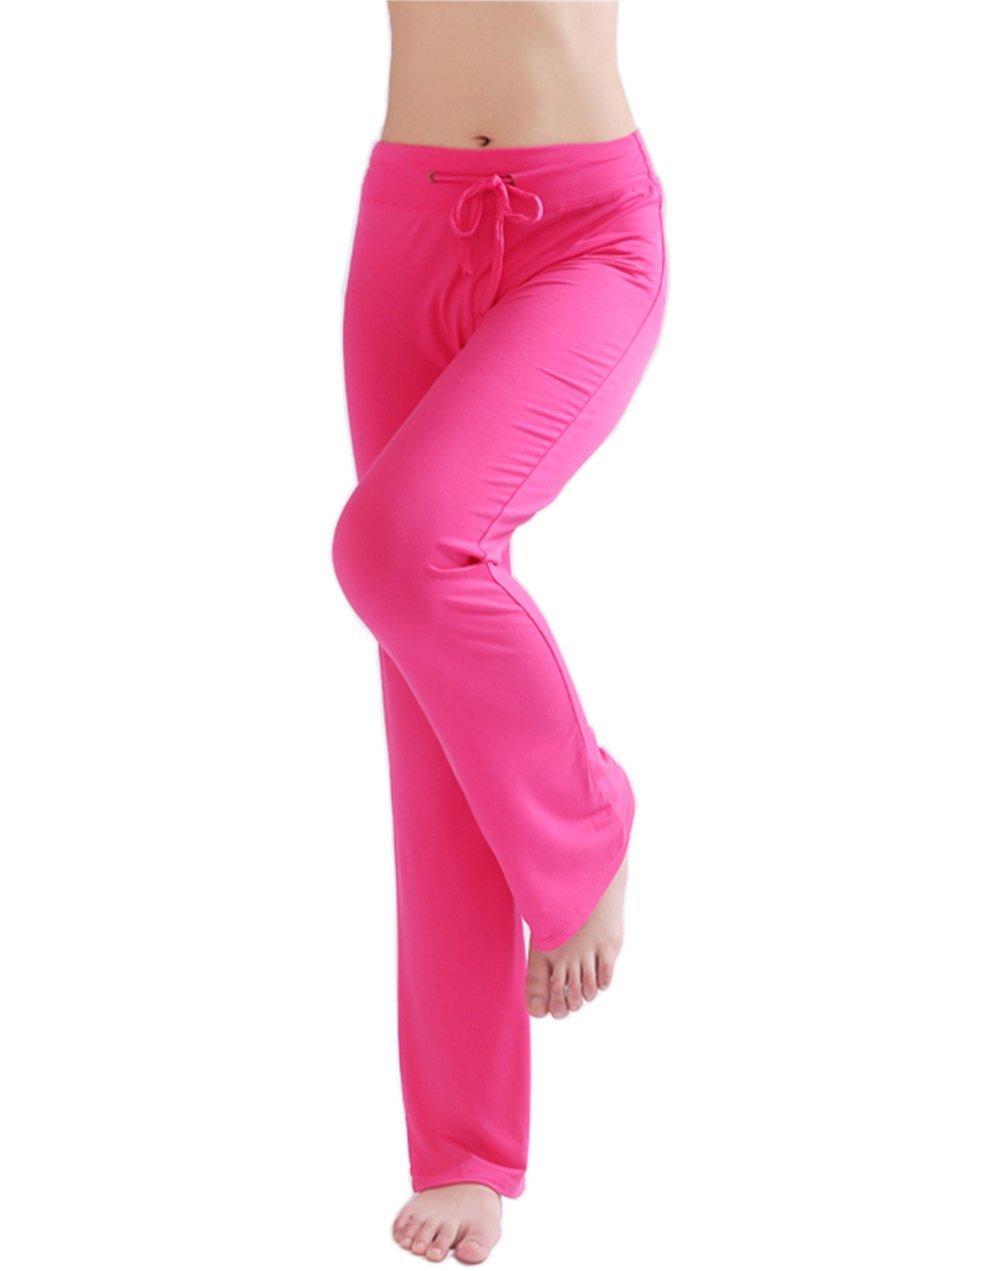 Hoerev Women's Soft Modal Slimming Lounge Pants Yoga Pants Pajama Pant